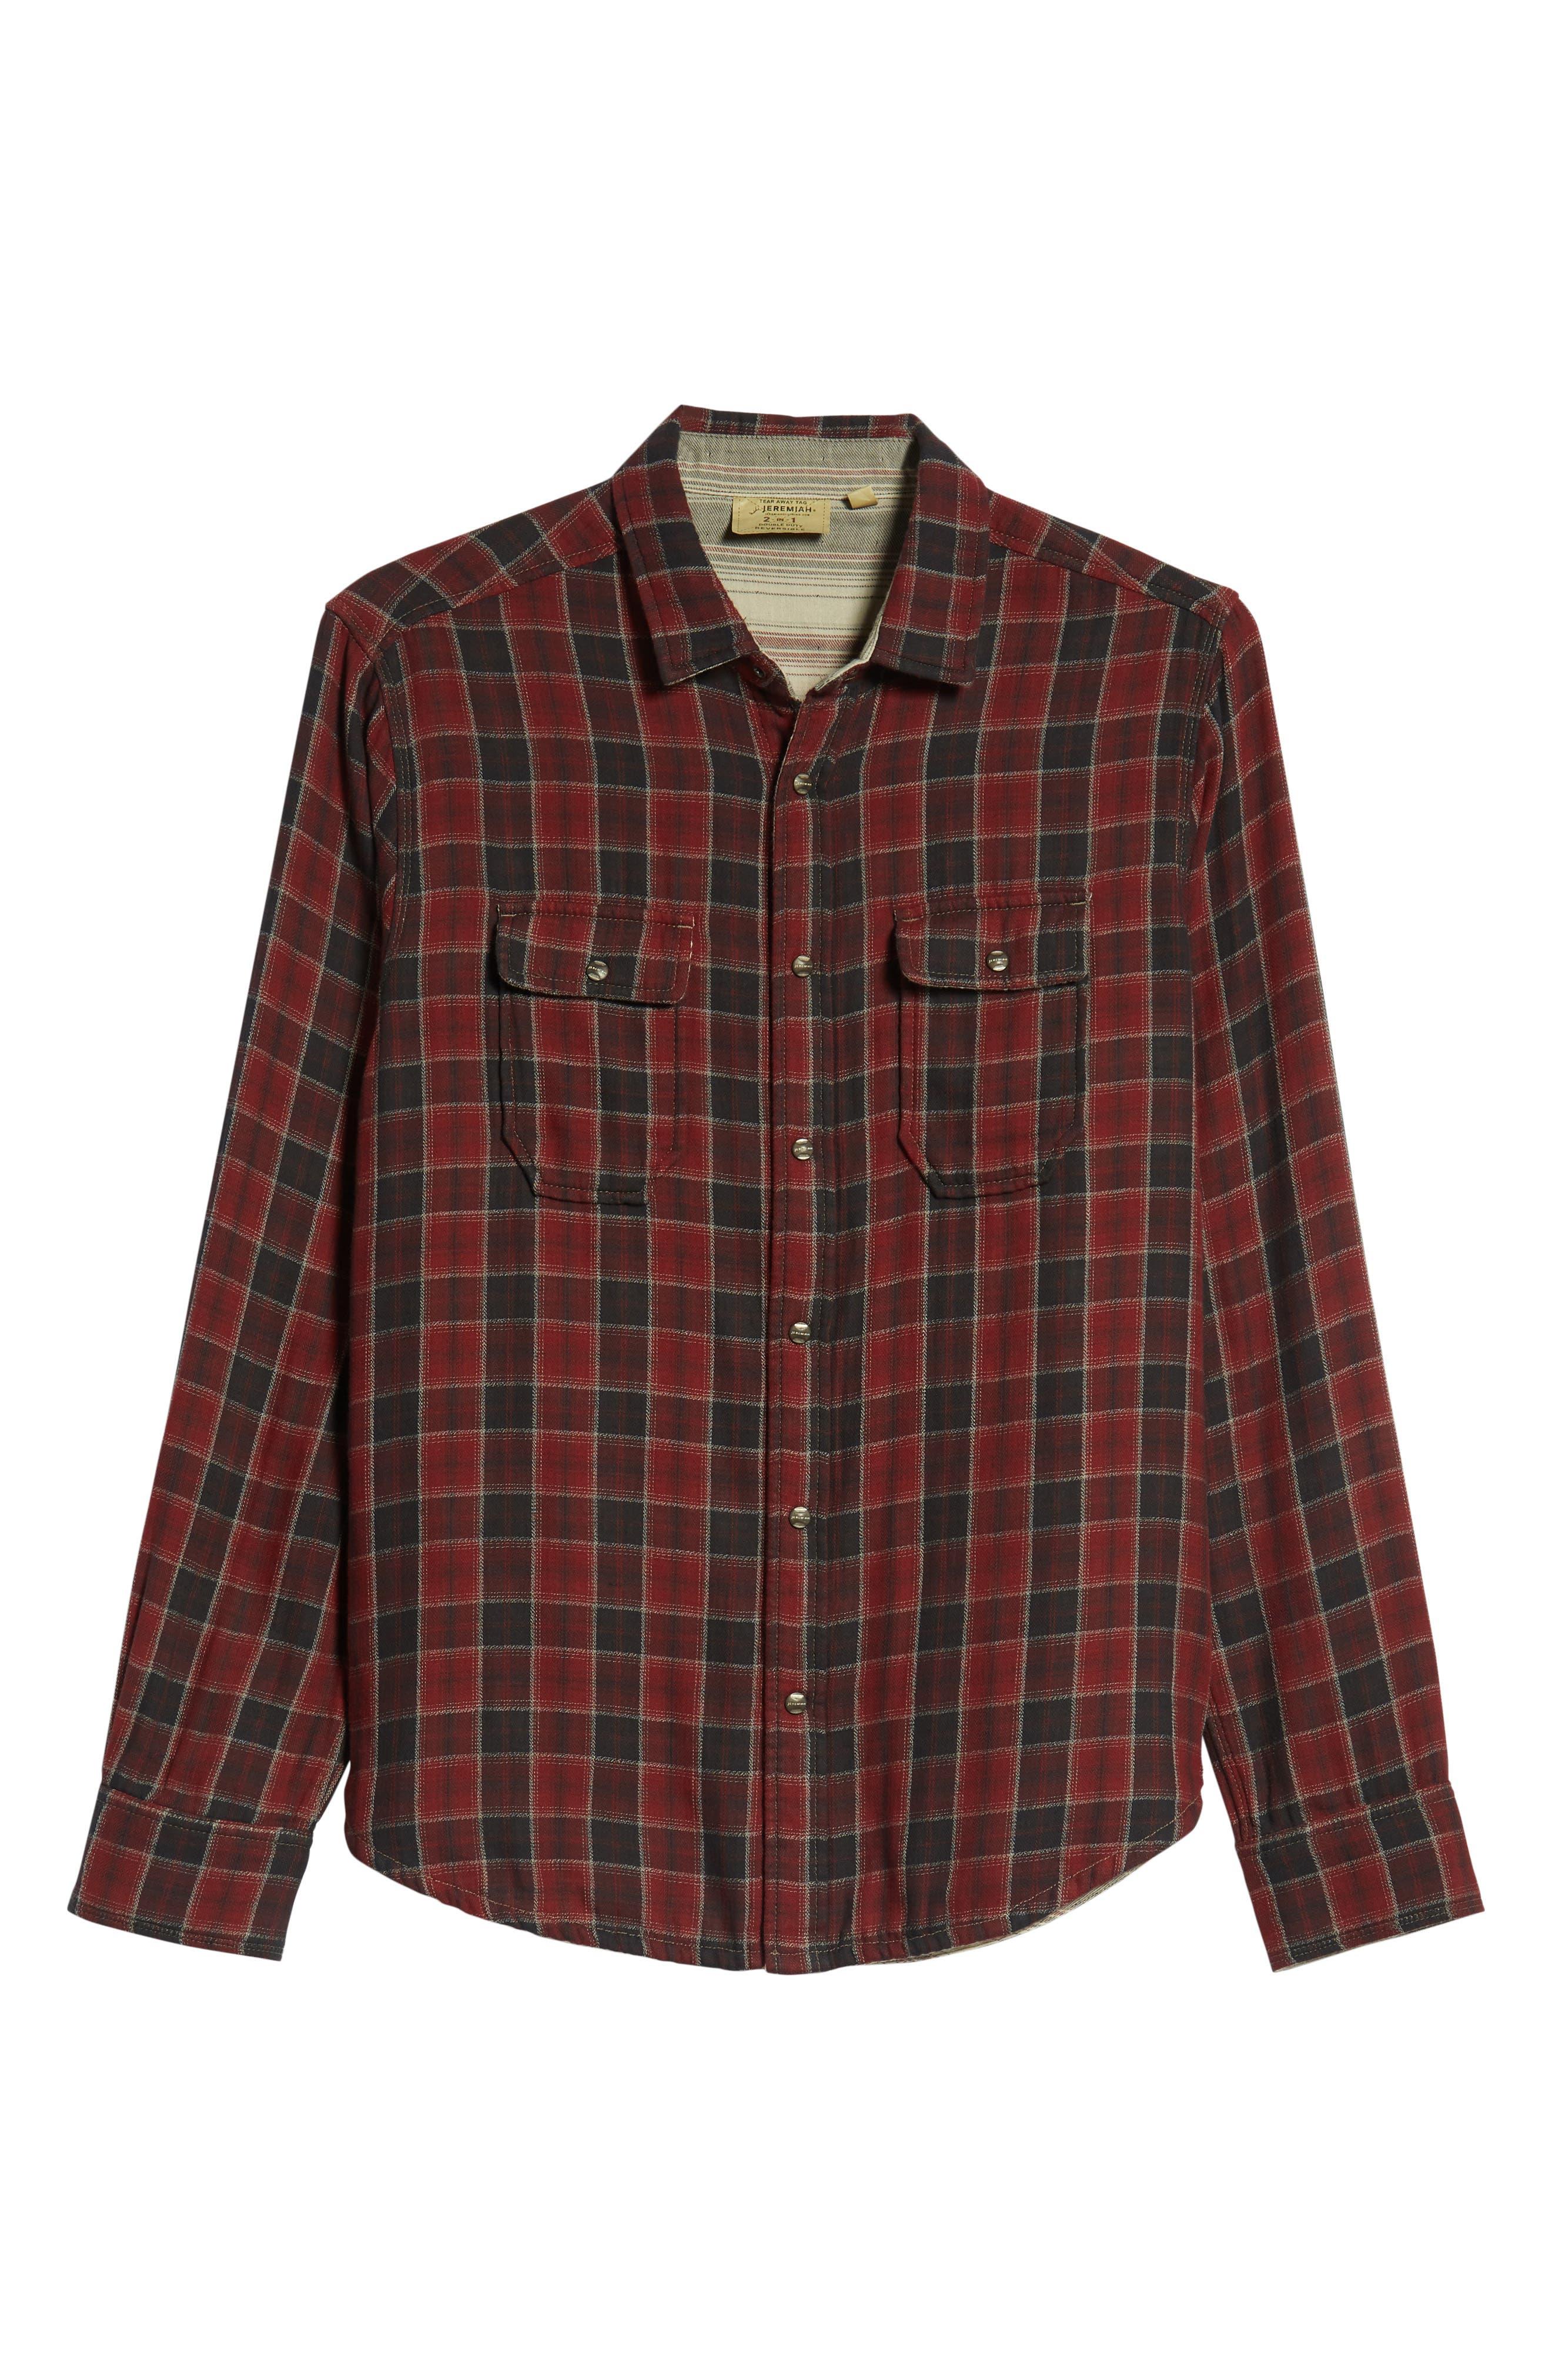 Boulder Regular Fit Reversible Plaid Shirt,                             Alternate thumbnail 6, color,                             OXBLOOD